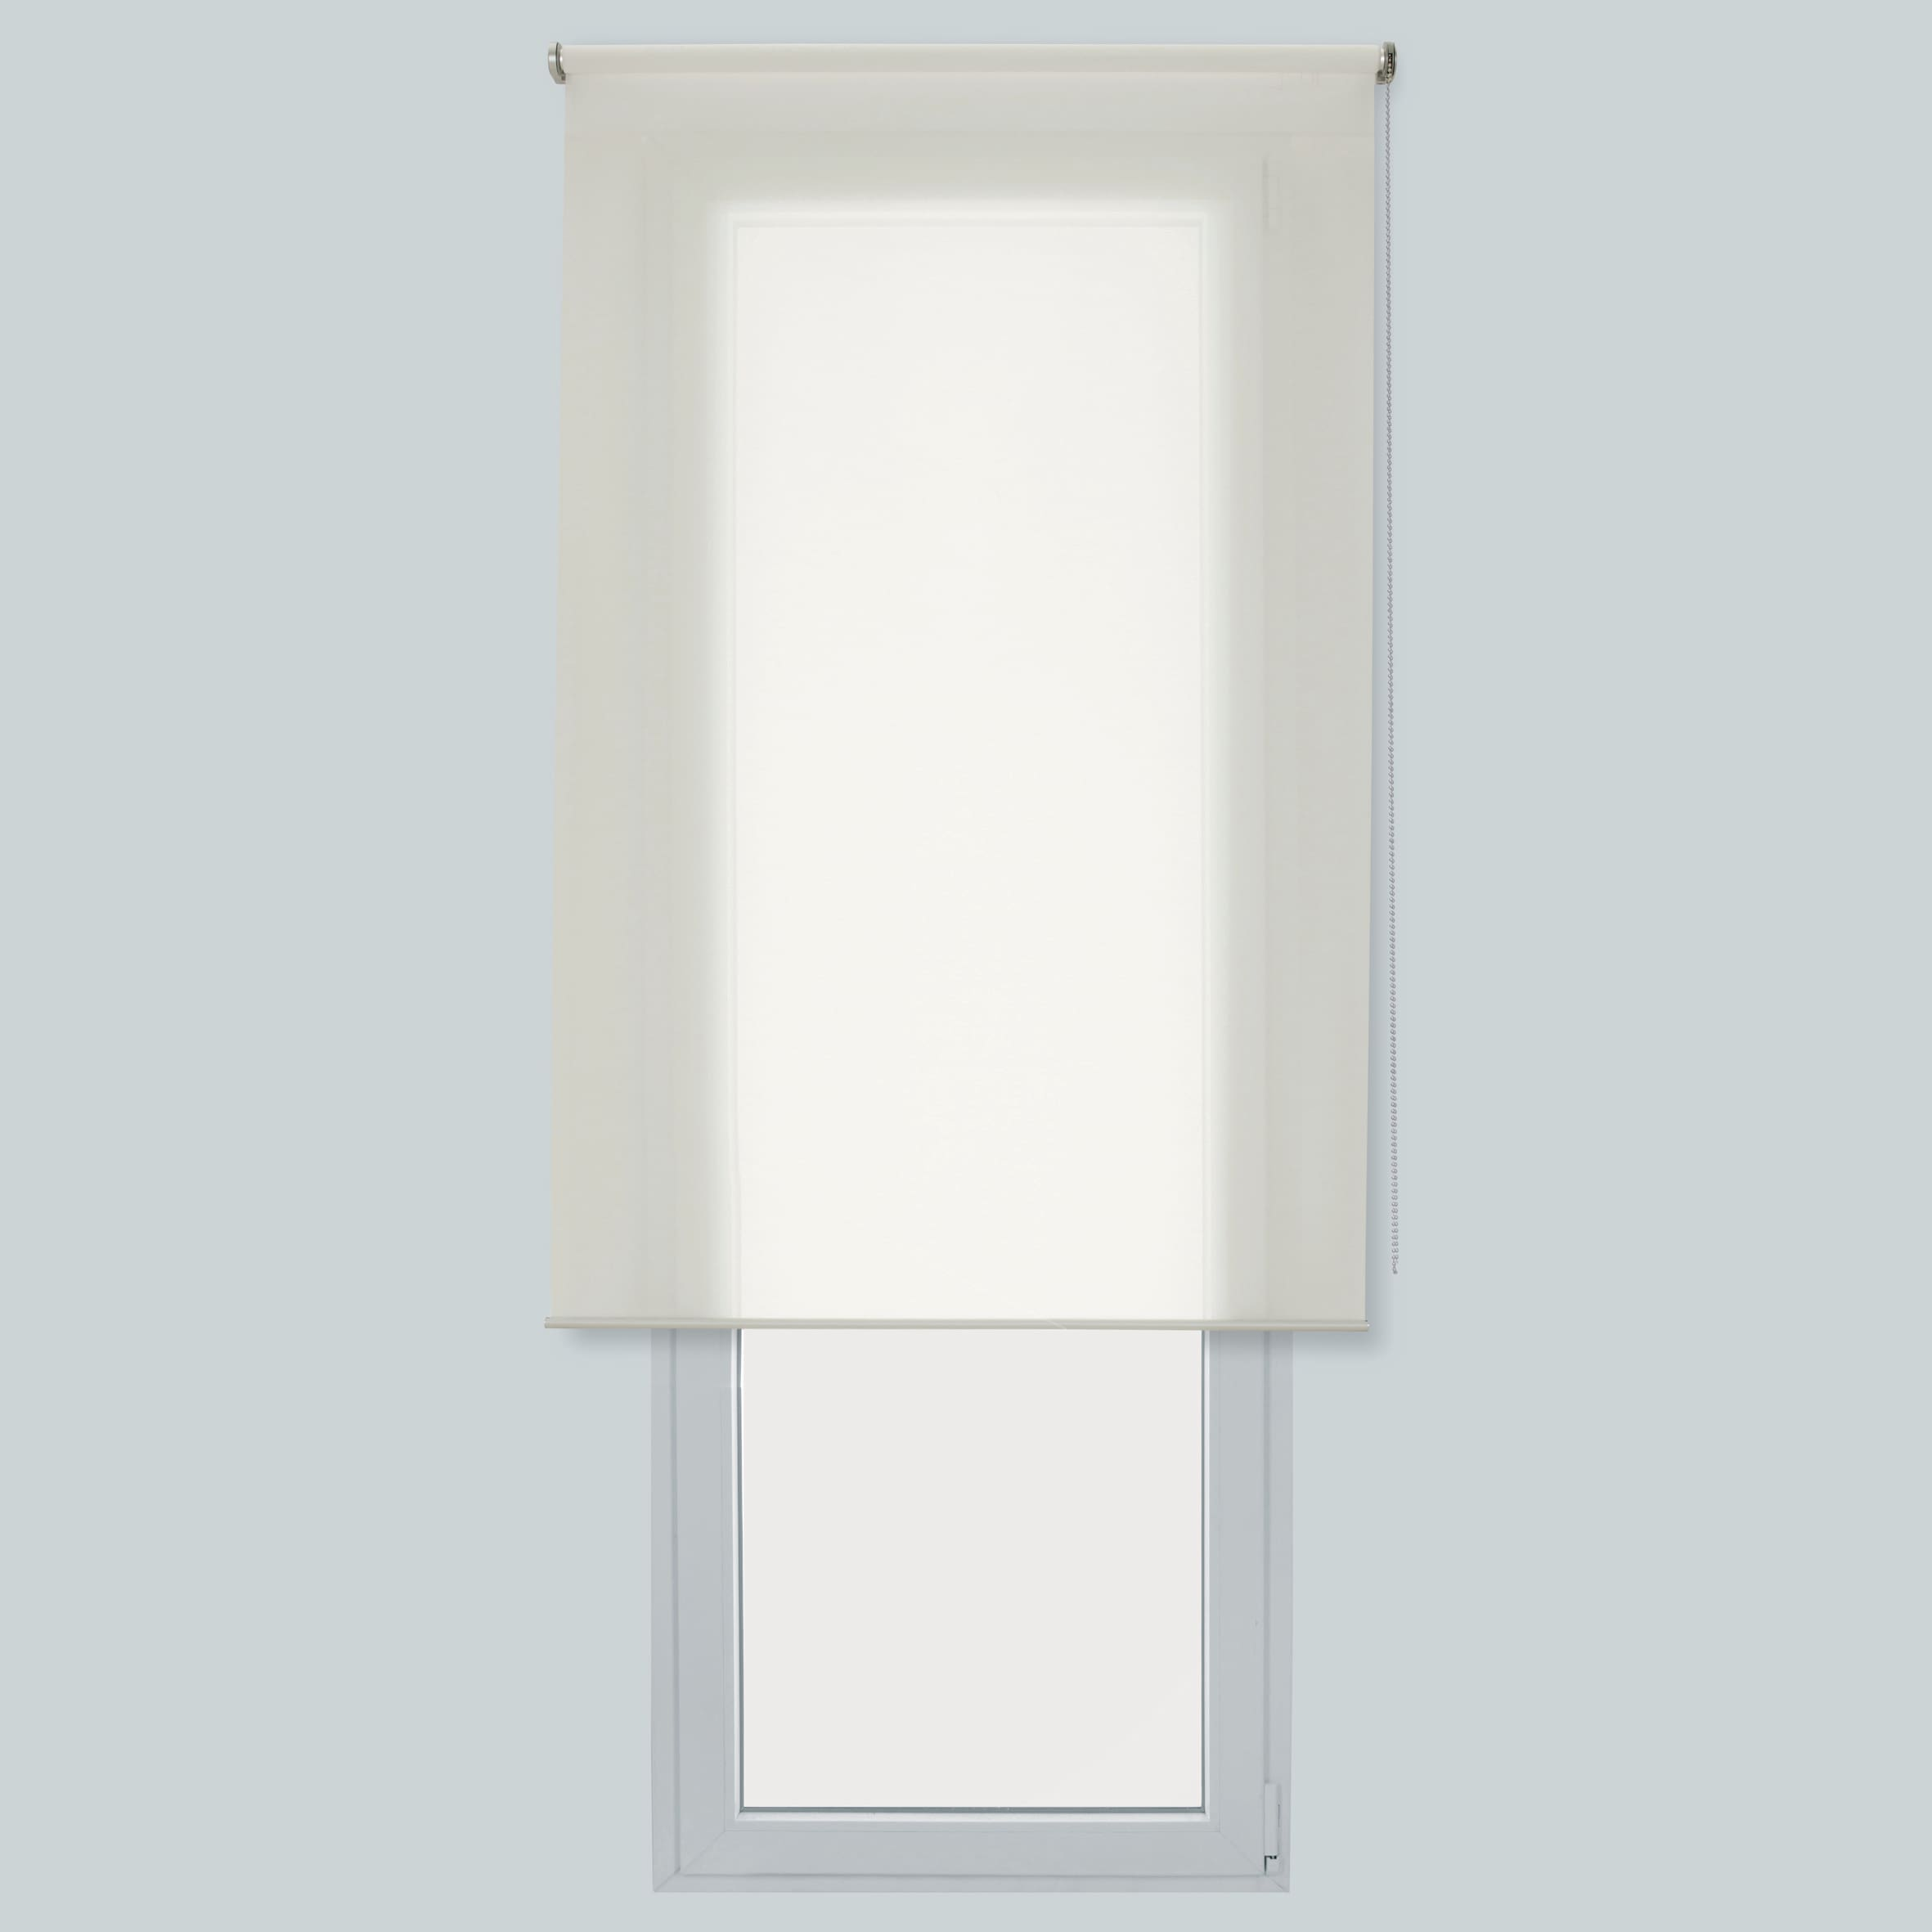 Tenda A Rullo Mesh Bianco 140 X 250 Cm Prezzi E Offerte Online